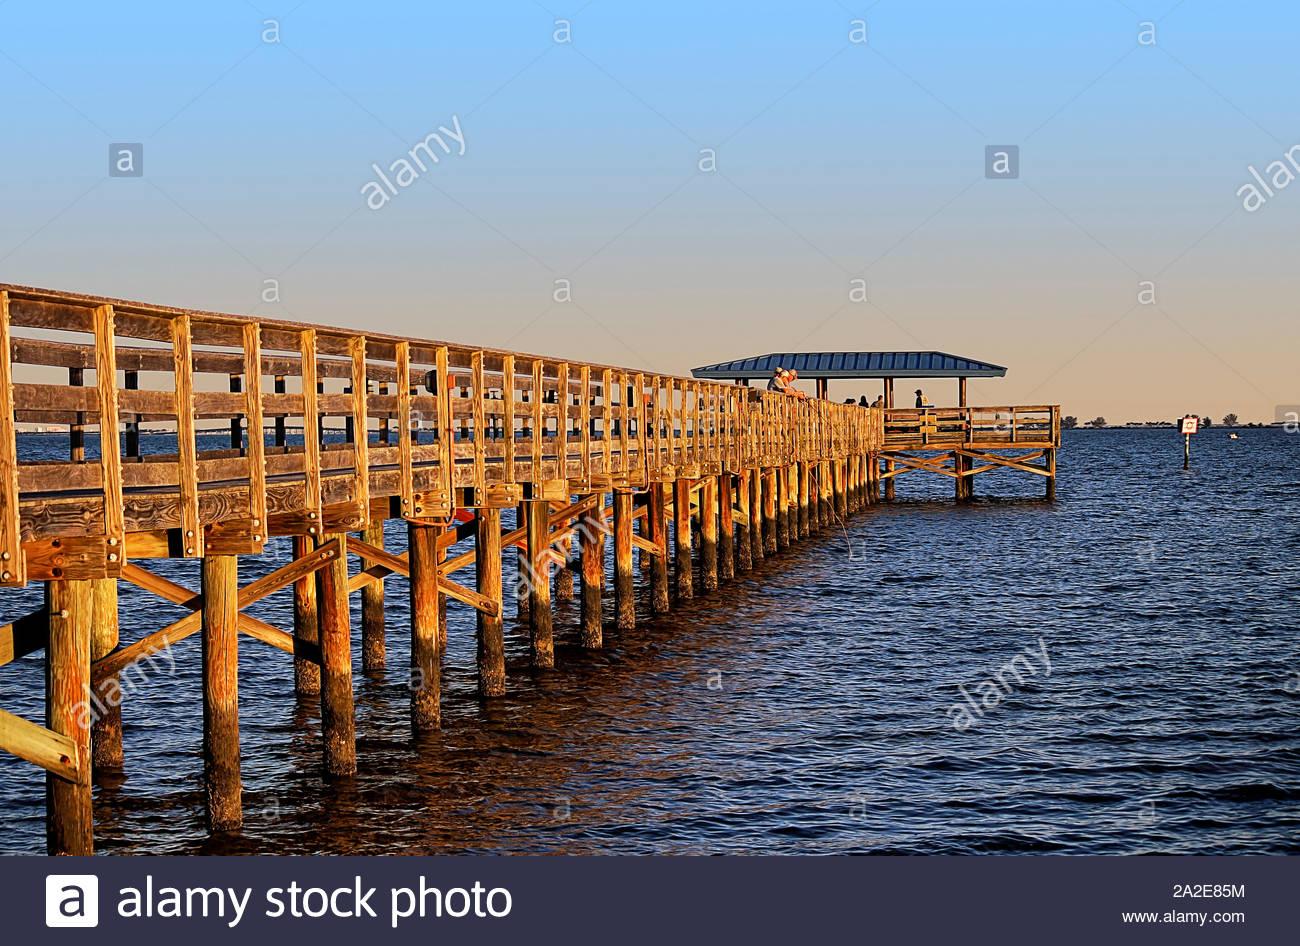 Marina Park Fishing Pier. Boardwalk located south of Safety Harbor, facing Tampa Bay. Photo taken at sunset Stock Photo